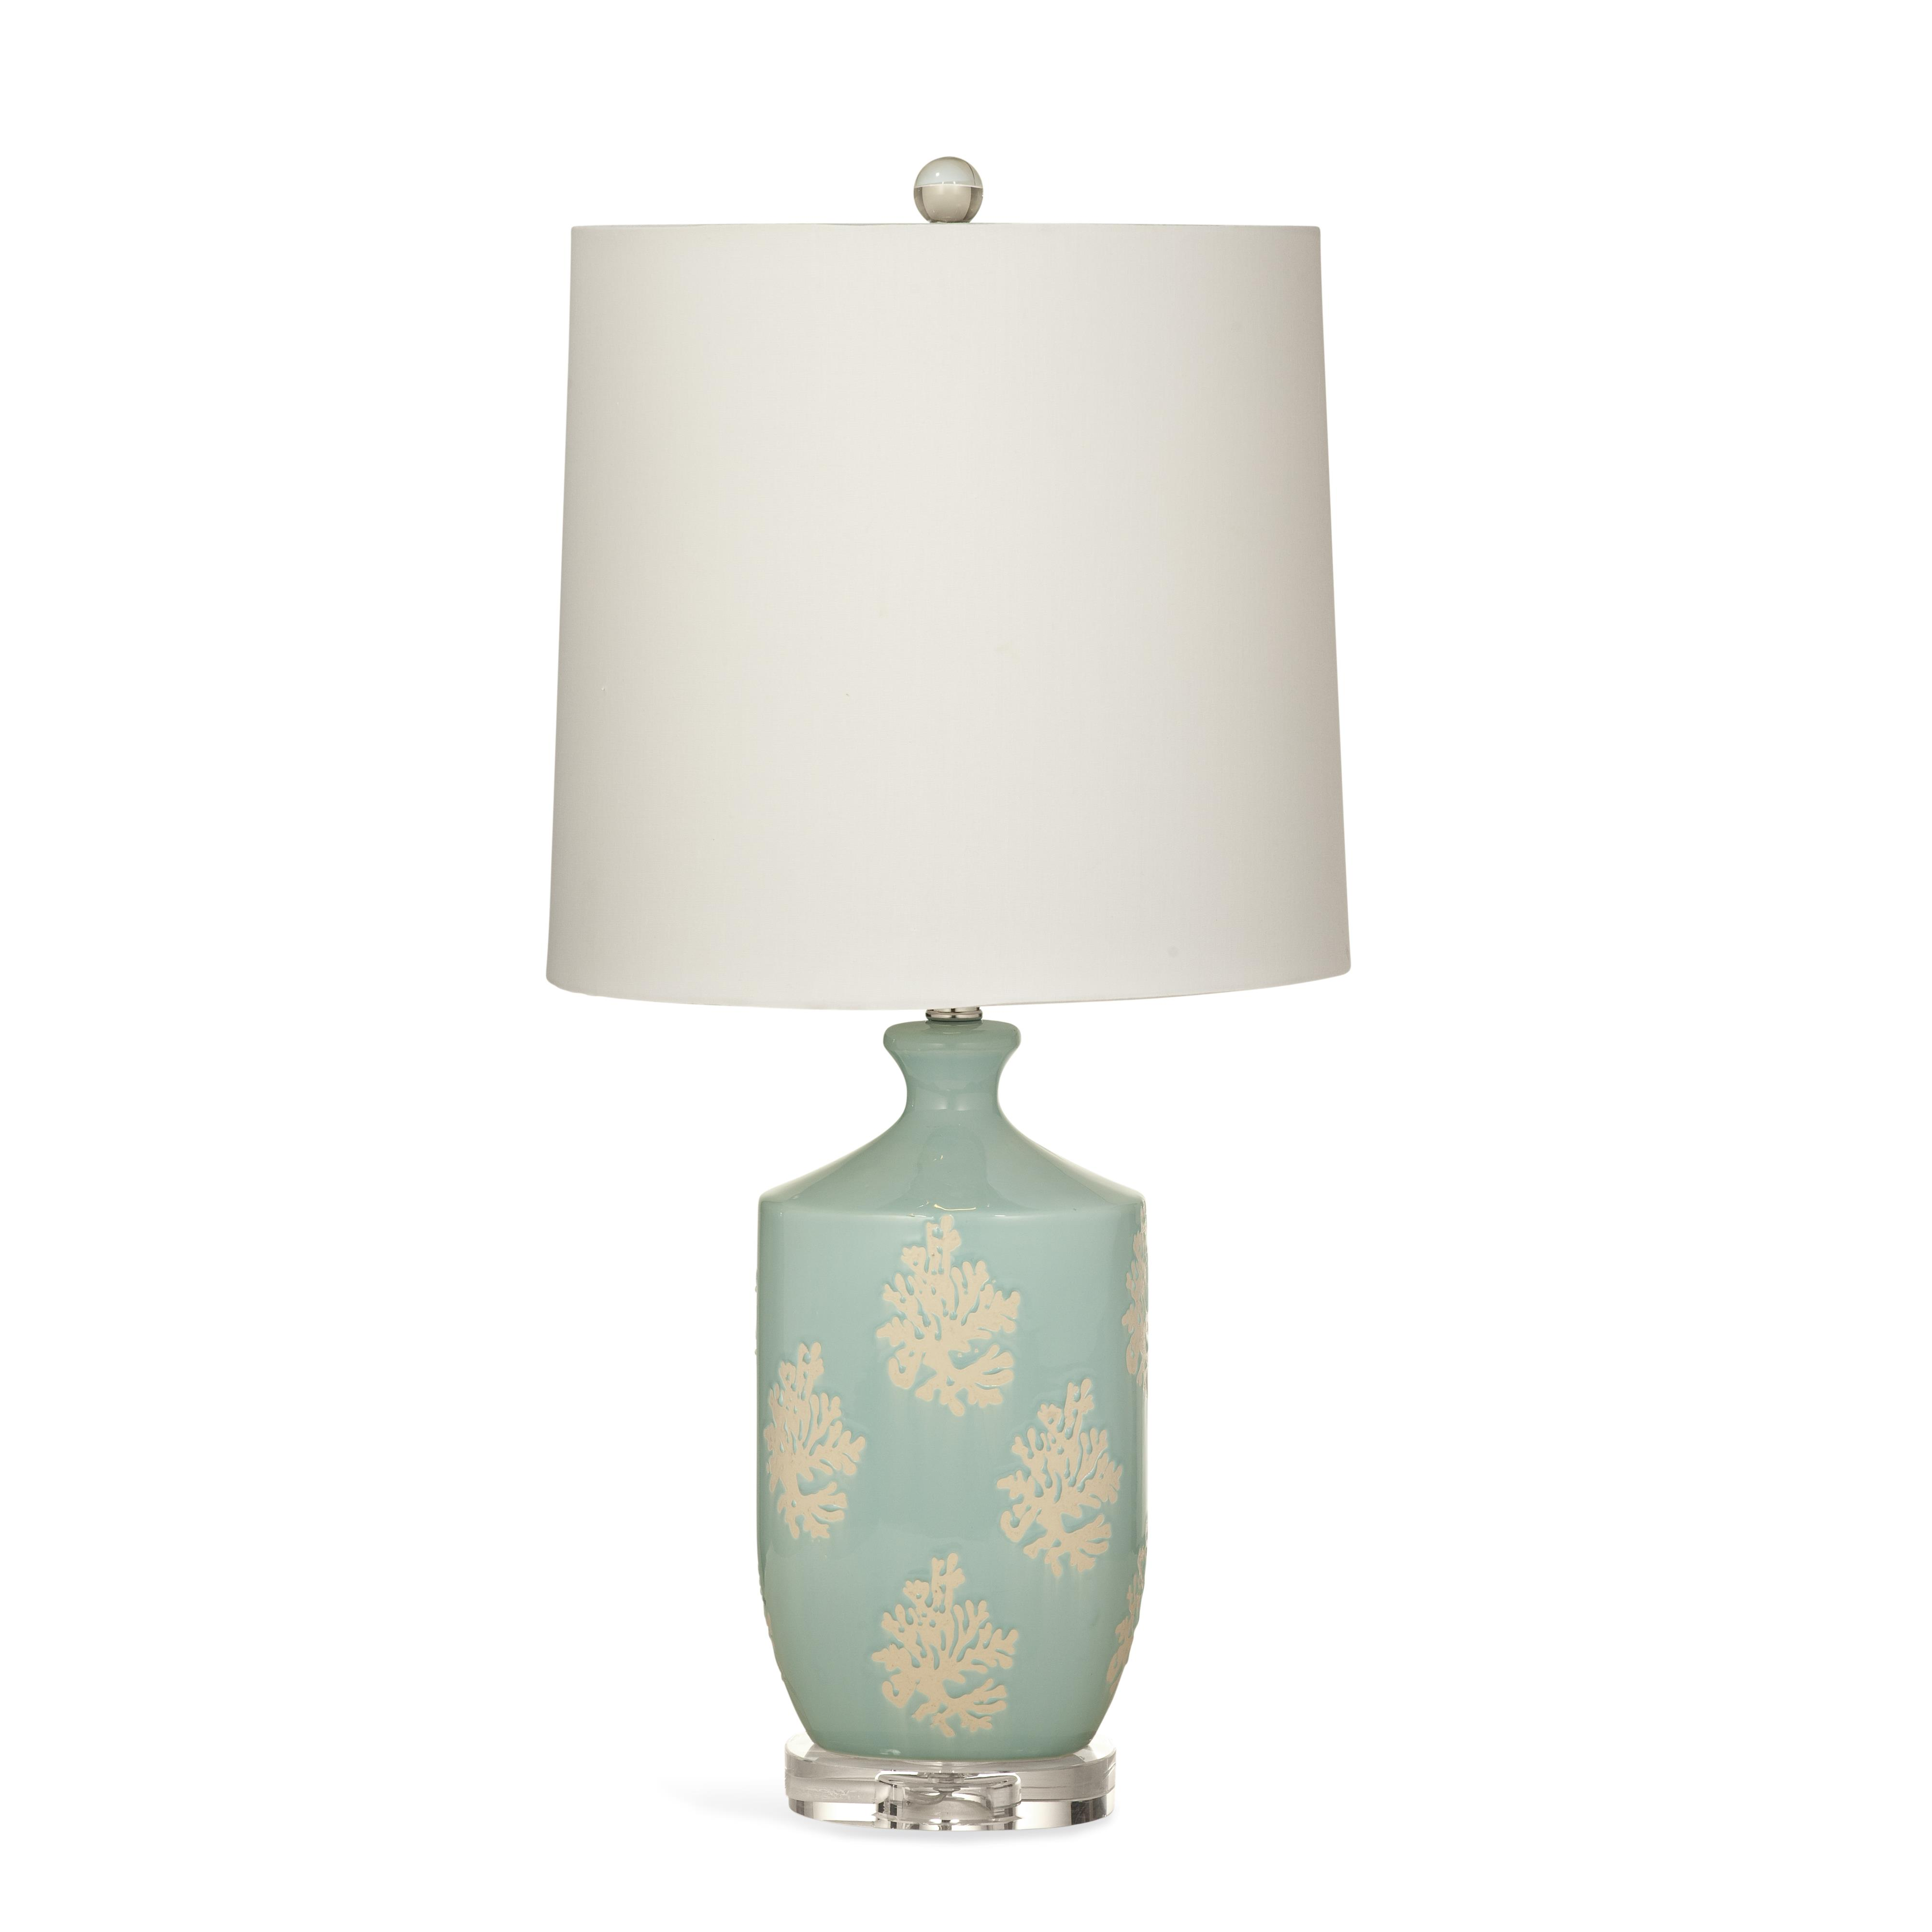 Pan Pacific Redington Table Lamp by Bassett Mirror at Alison Craig Home Furnishings